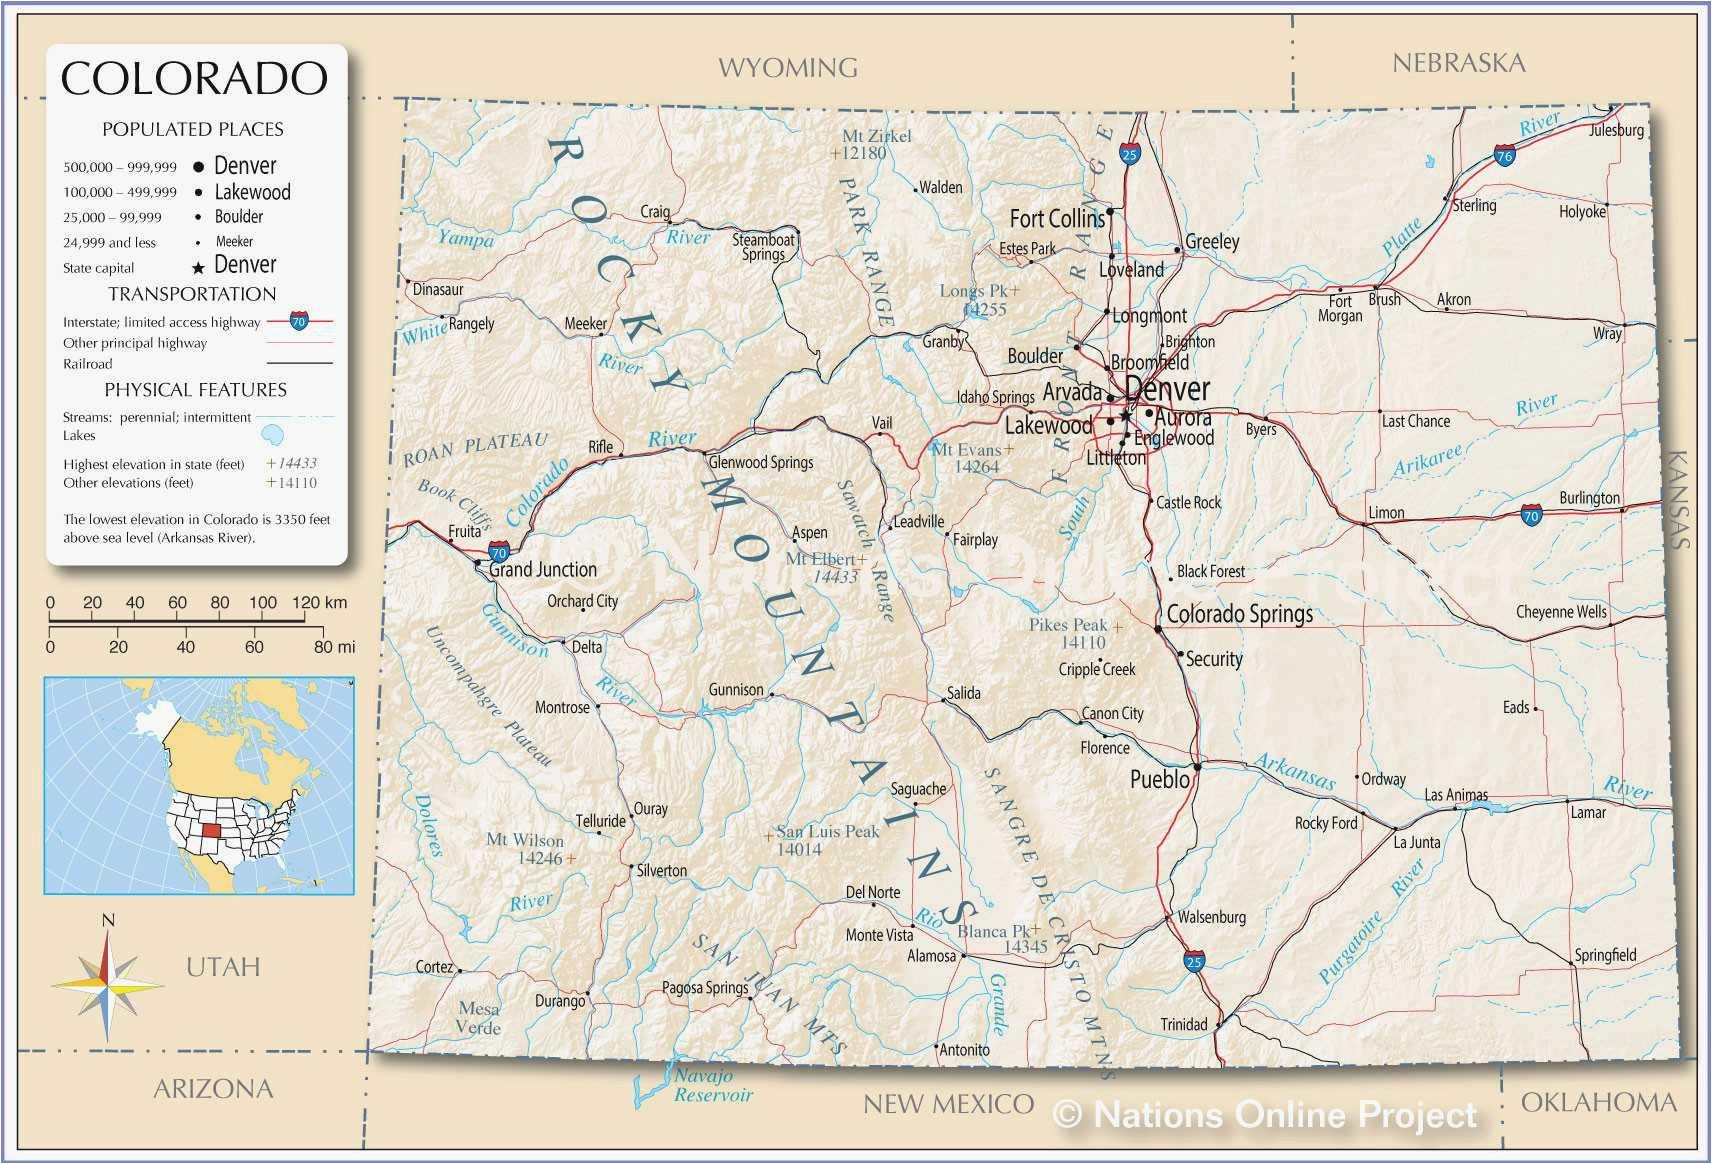 Maps Google Com Denver on denver maps by neighborhood, denver city street map, denver art museum map, denver on map,